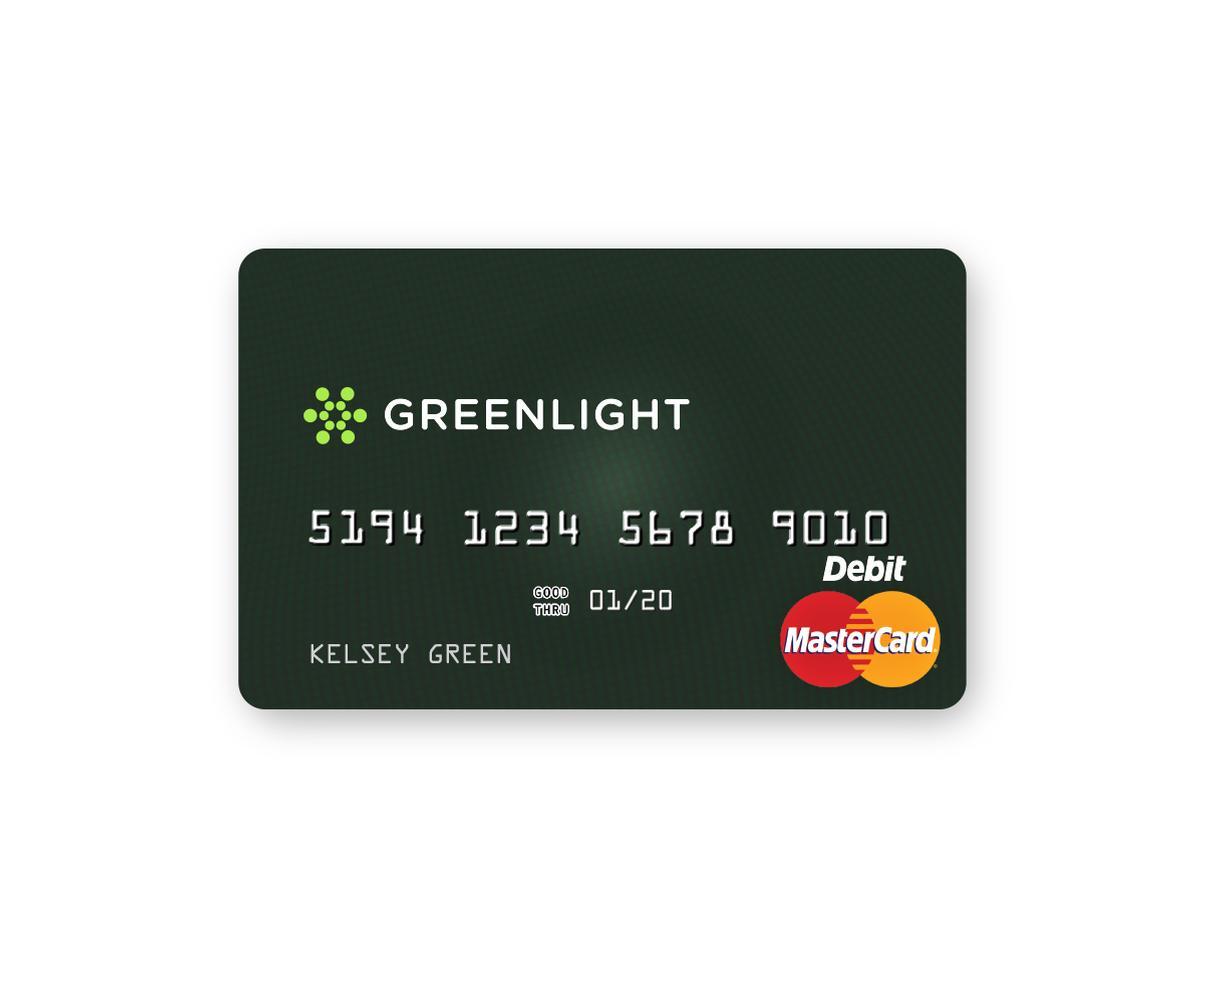 Raise Financially Smart Kids With Greenlight®, The Smart Debit Card for Kids